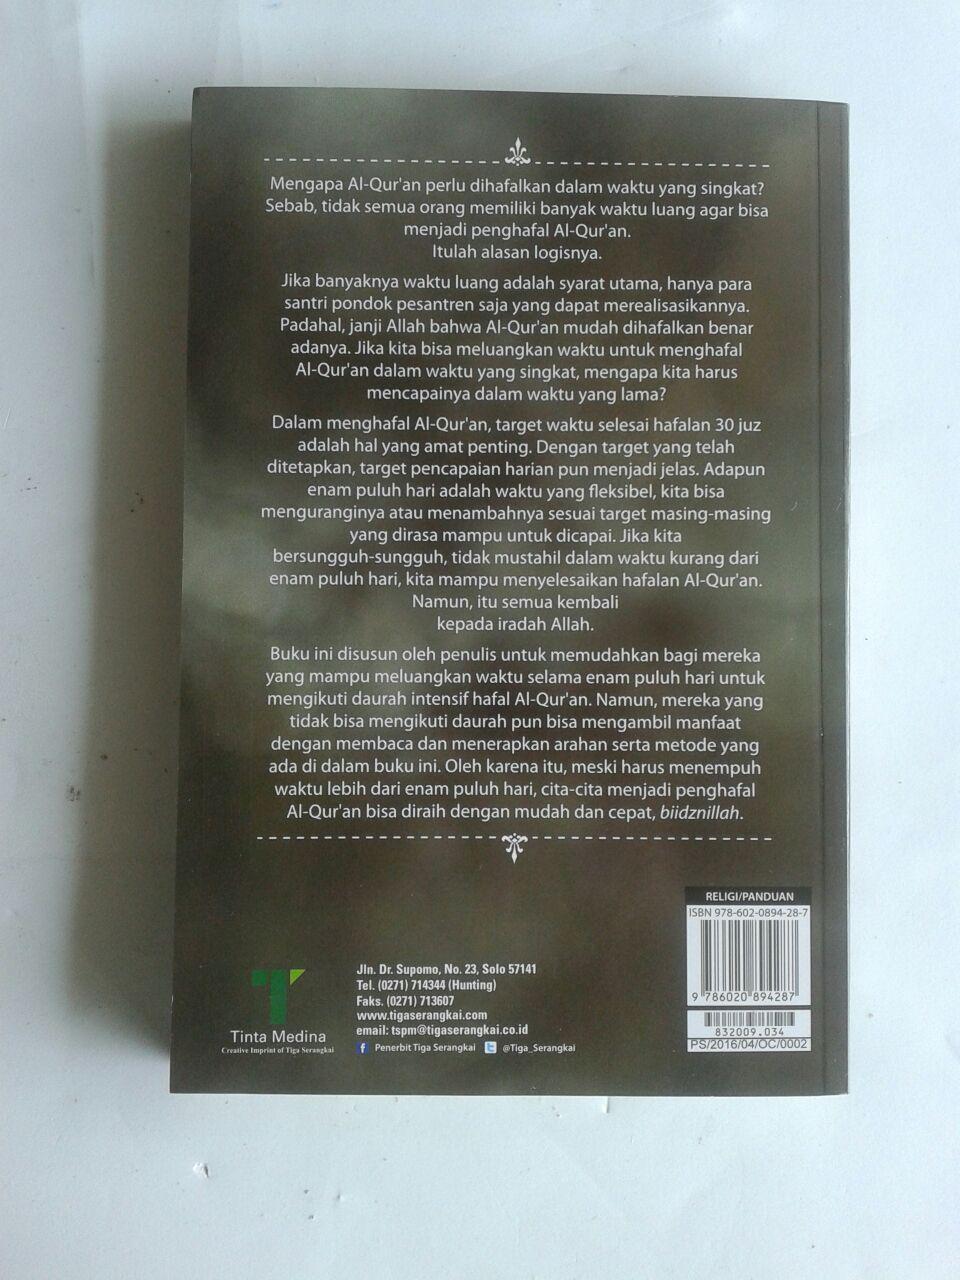 Buku 60 Hari Hafal Al-Qur'an Panduan Daurah Aplikatif cover